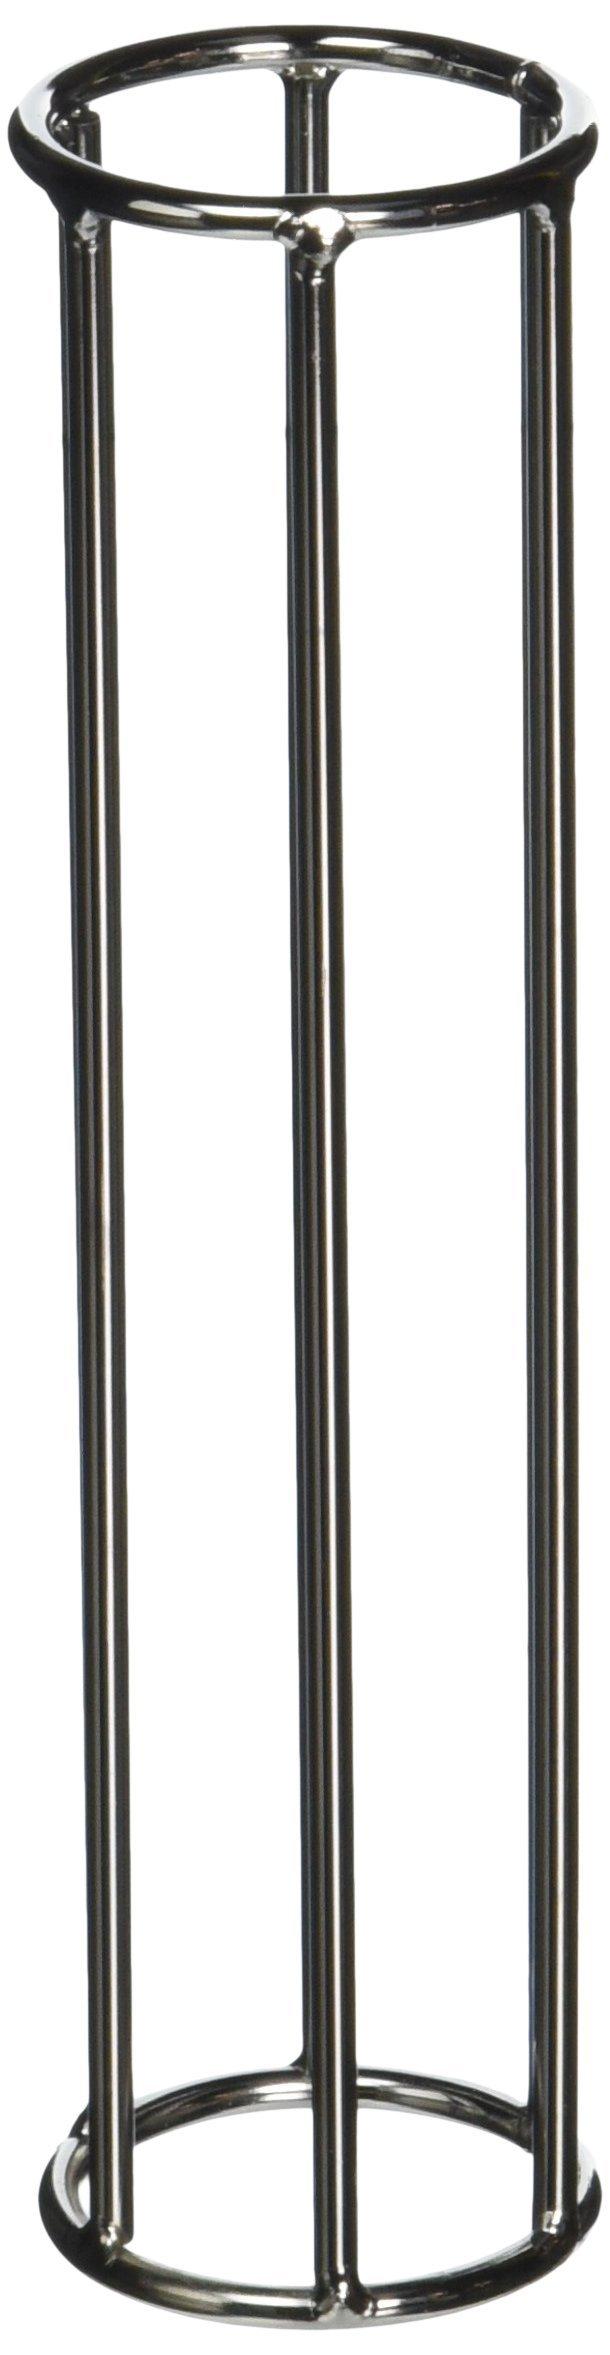 Derma Sciences GL231 Tubular Gauze Metal Cage Applicator, 1-Medium Size